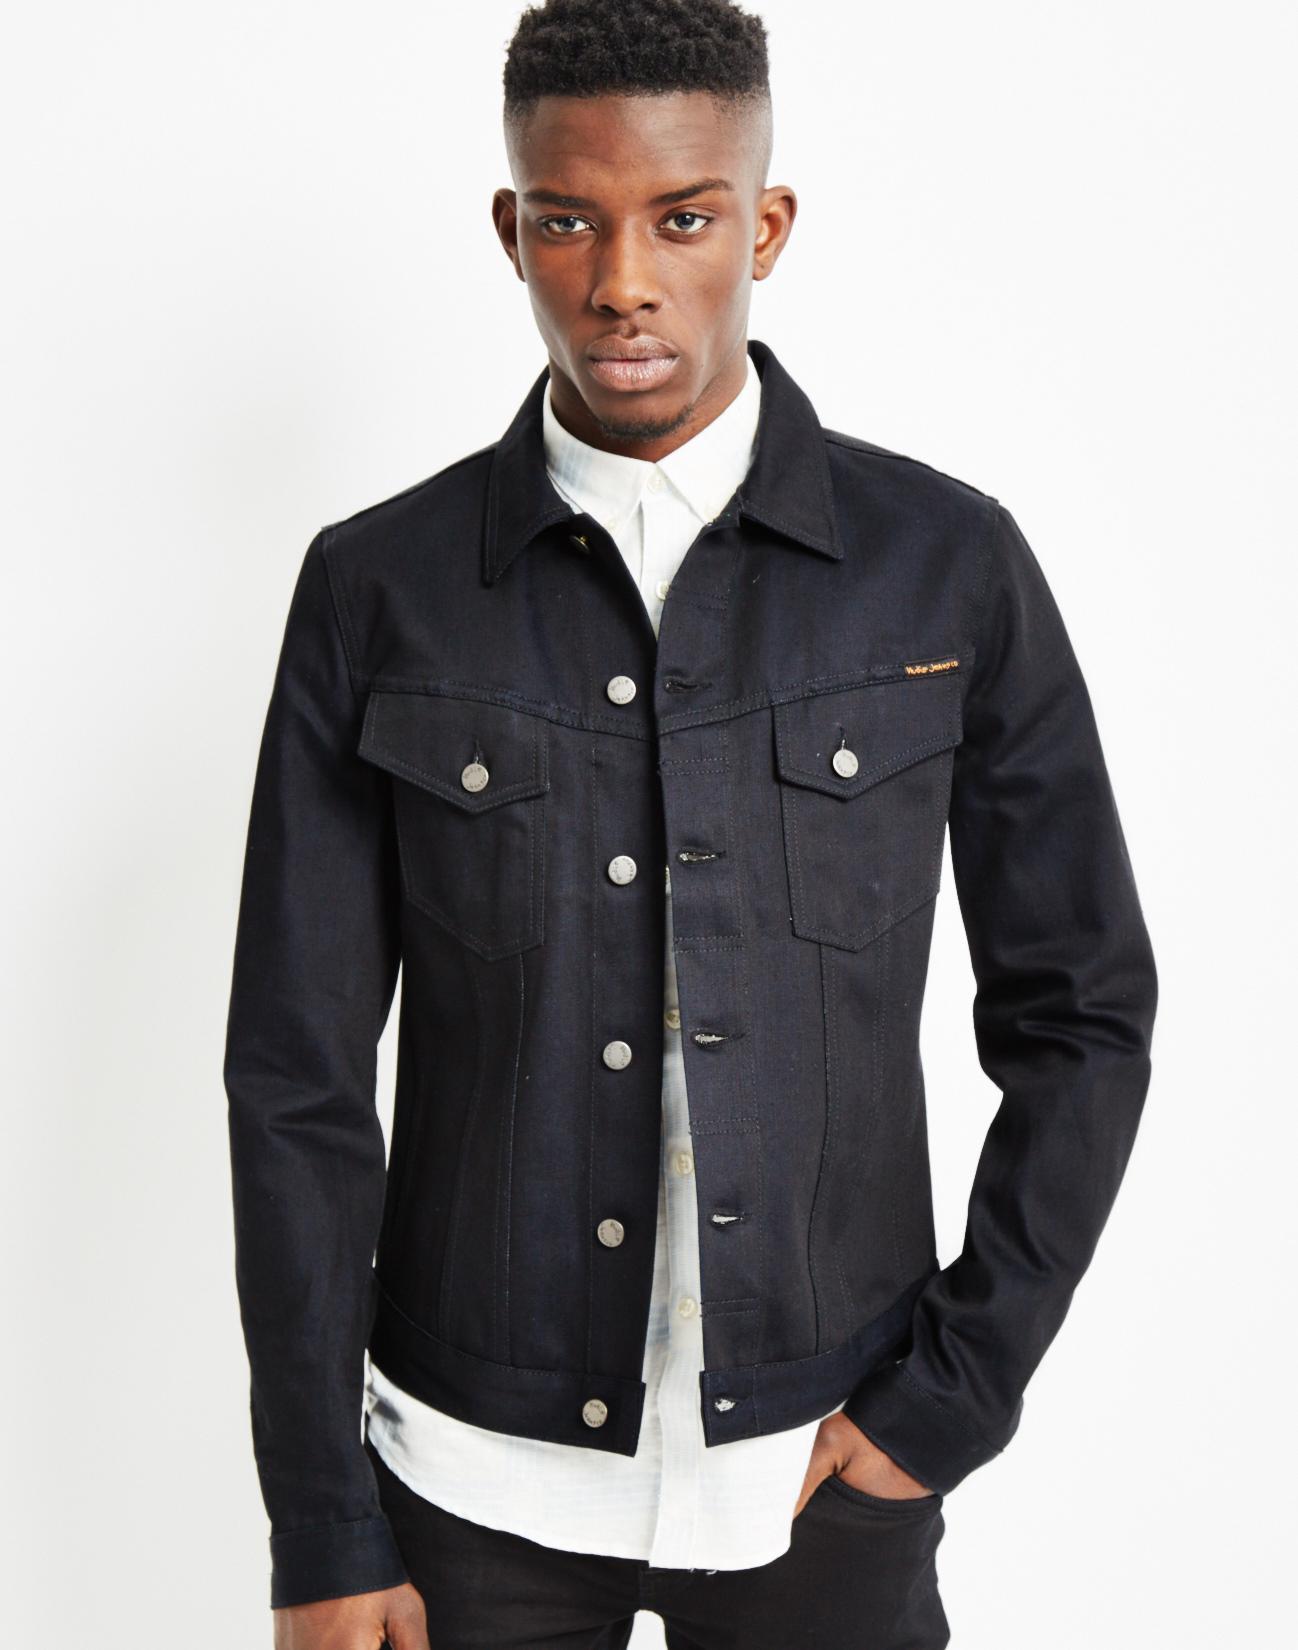 628cd16a76c Blue Denim Jacket Black Shirt